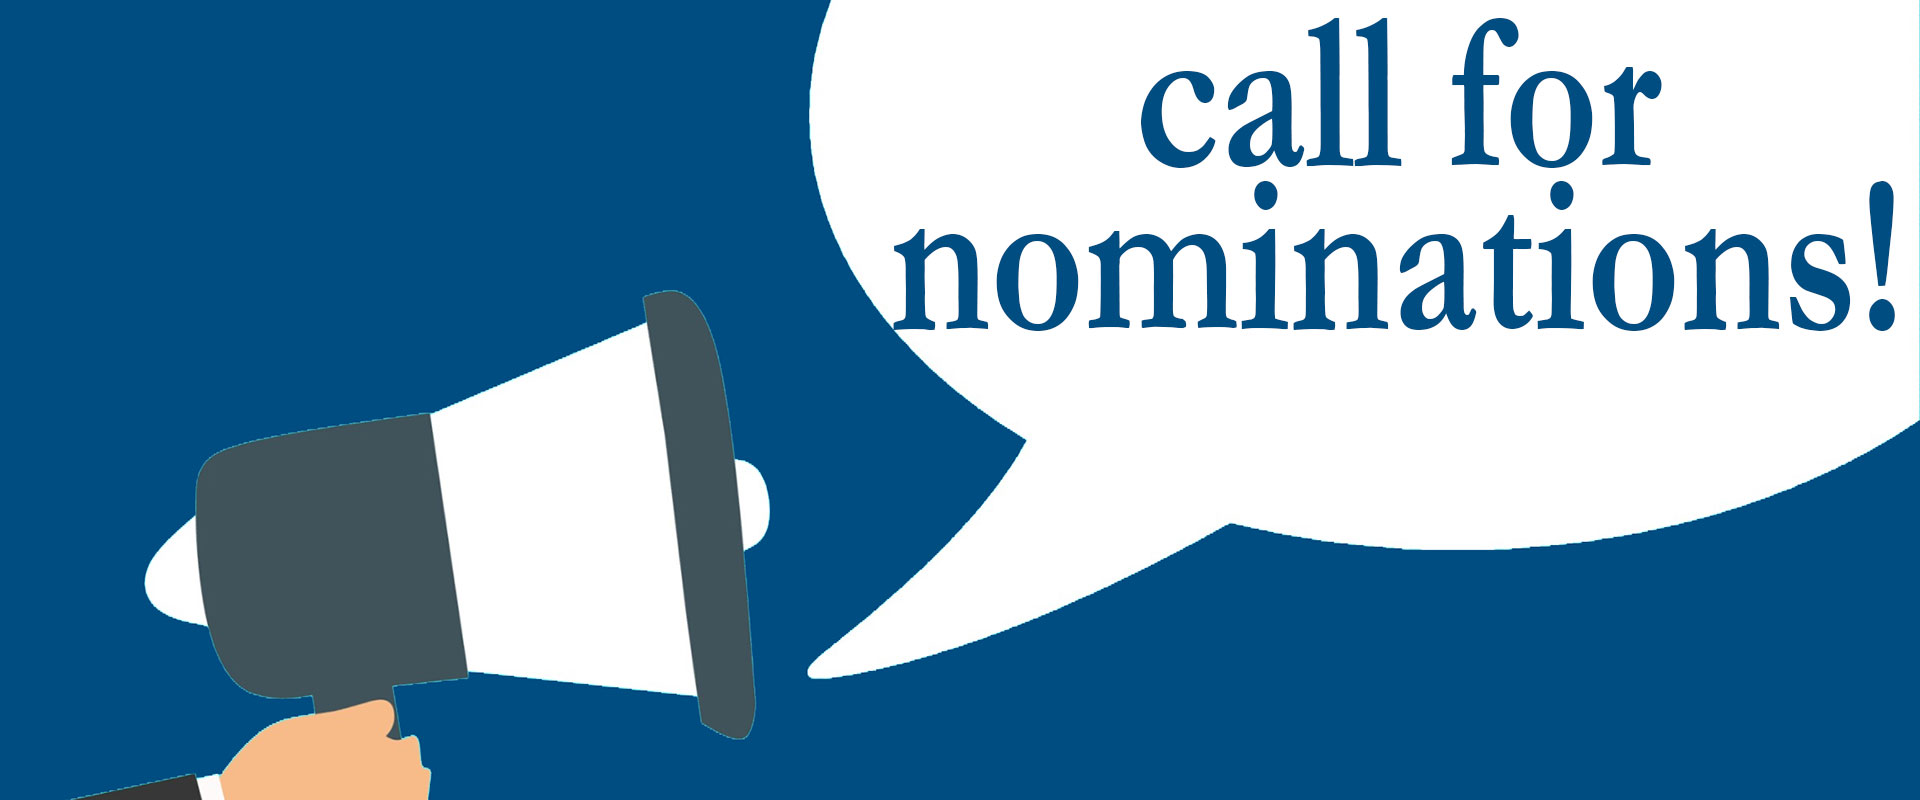 nominations-megaphone-3272935